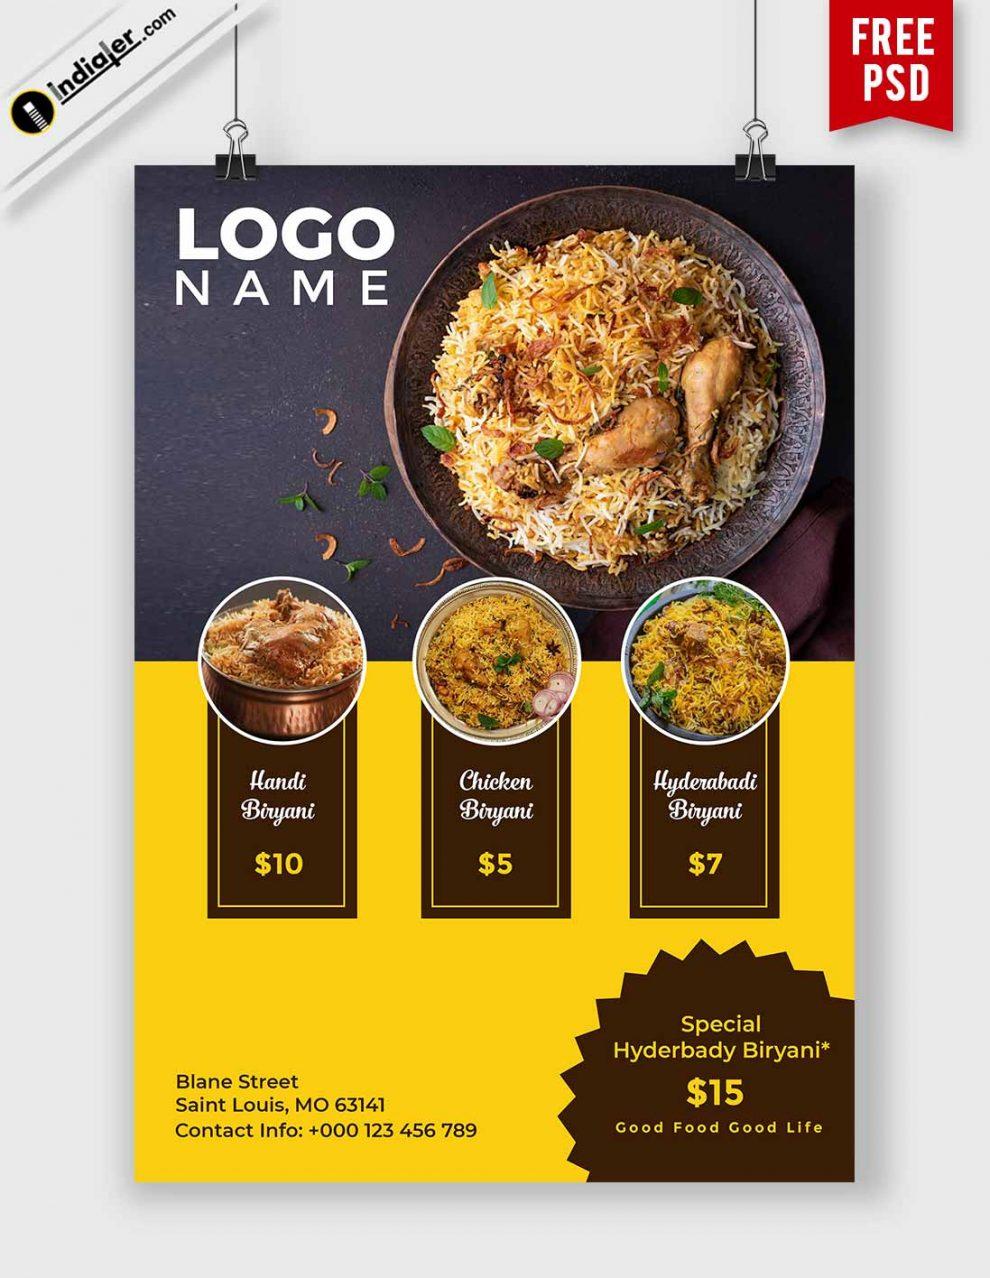 Download Best Biryani Food Flyer Free Psd Template Indiater Food Menu Design Brochure Food Food Poster Design